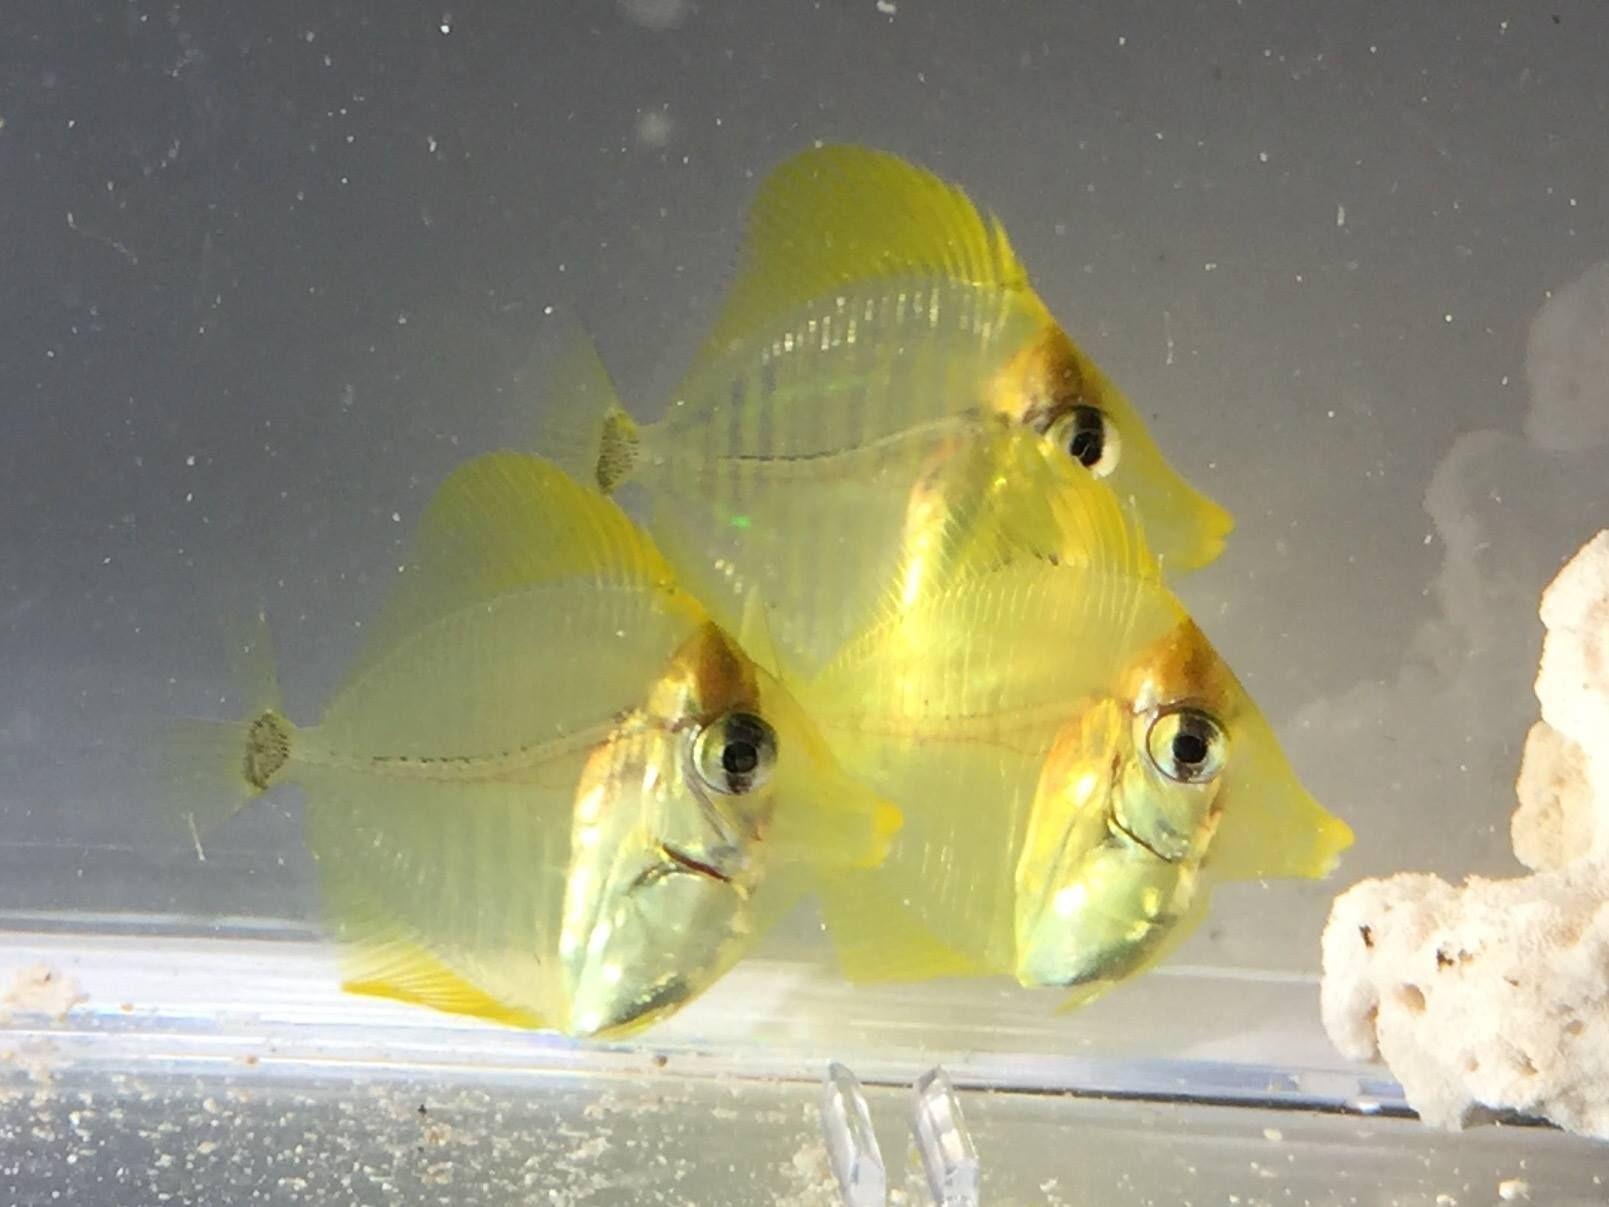 d447cde36a0a903b94d78dd13b1bf22d Frais De Aquarium Amazonien Concept